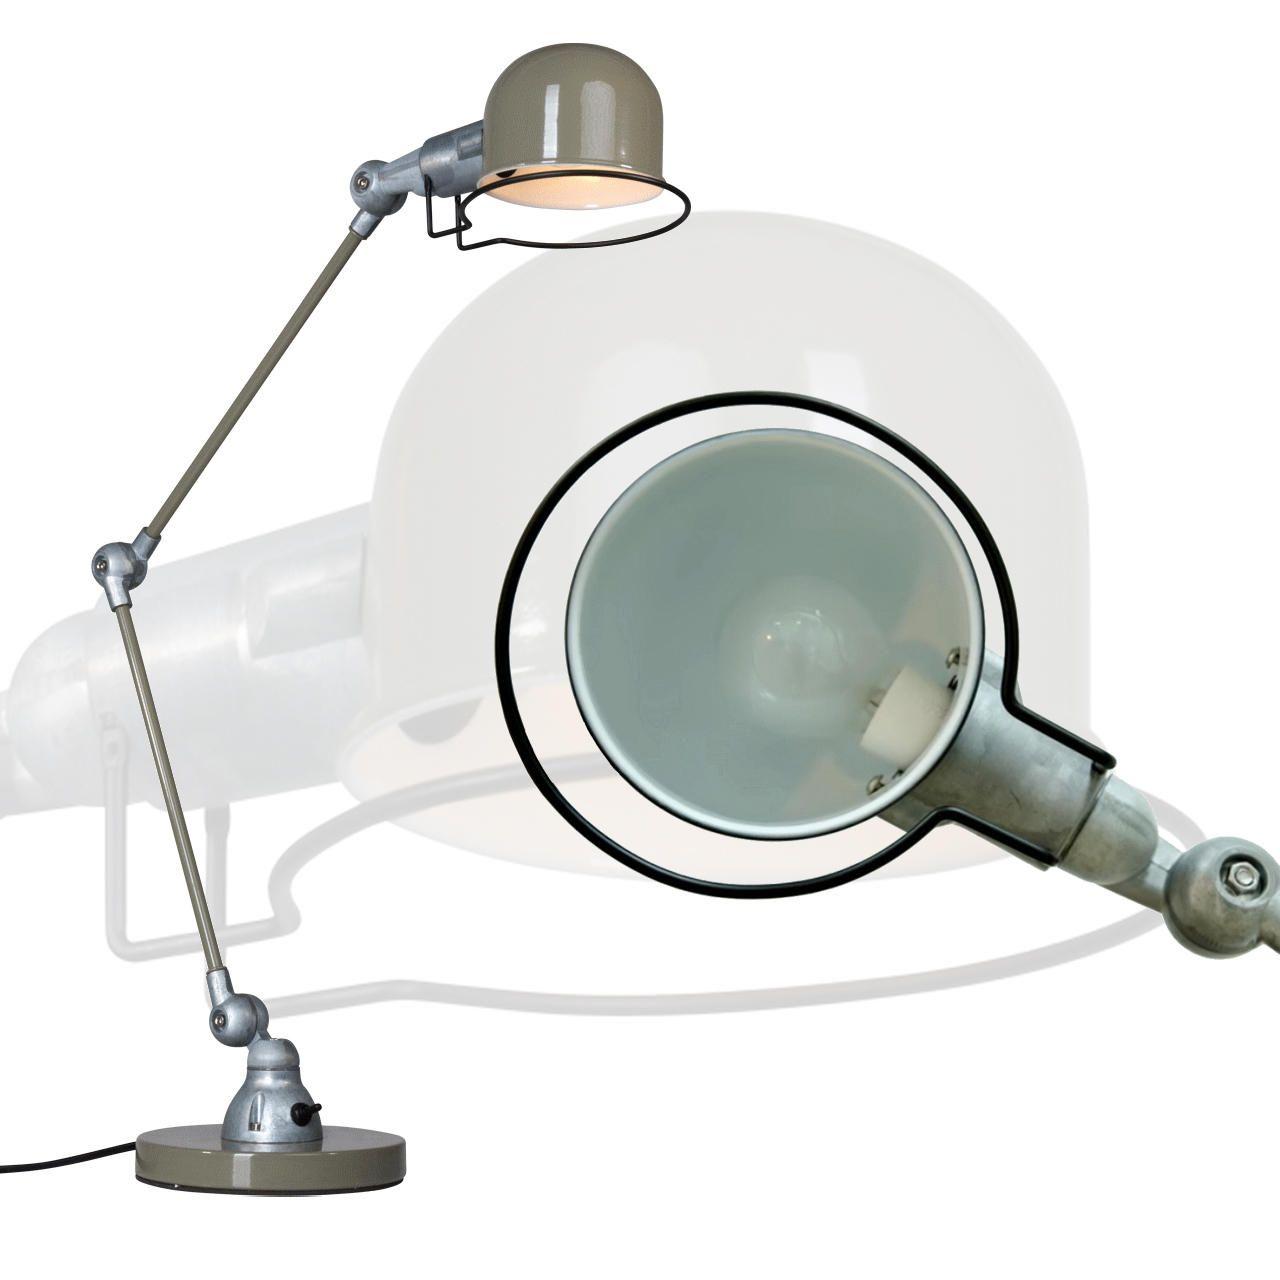 Industrieel groene bureaulamp Jikke LampenConcurrent.nl